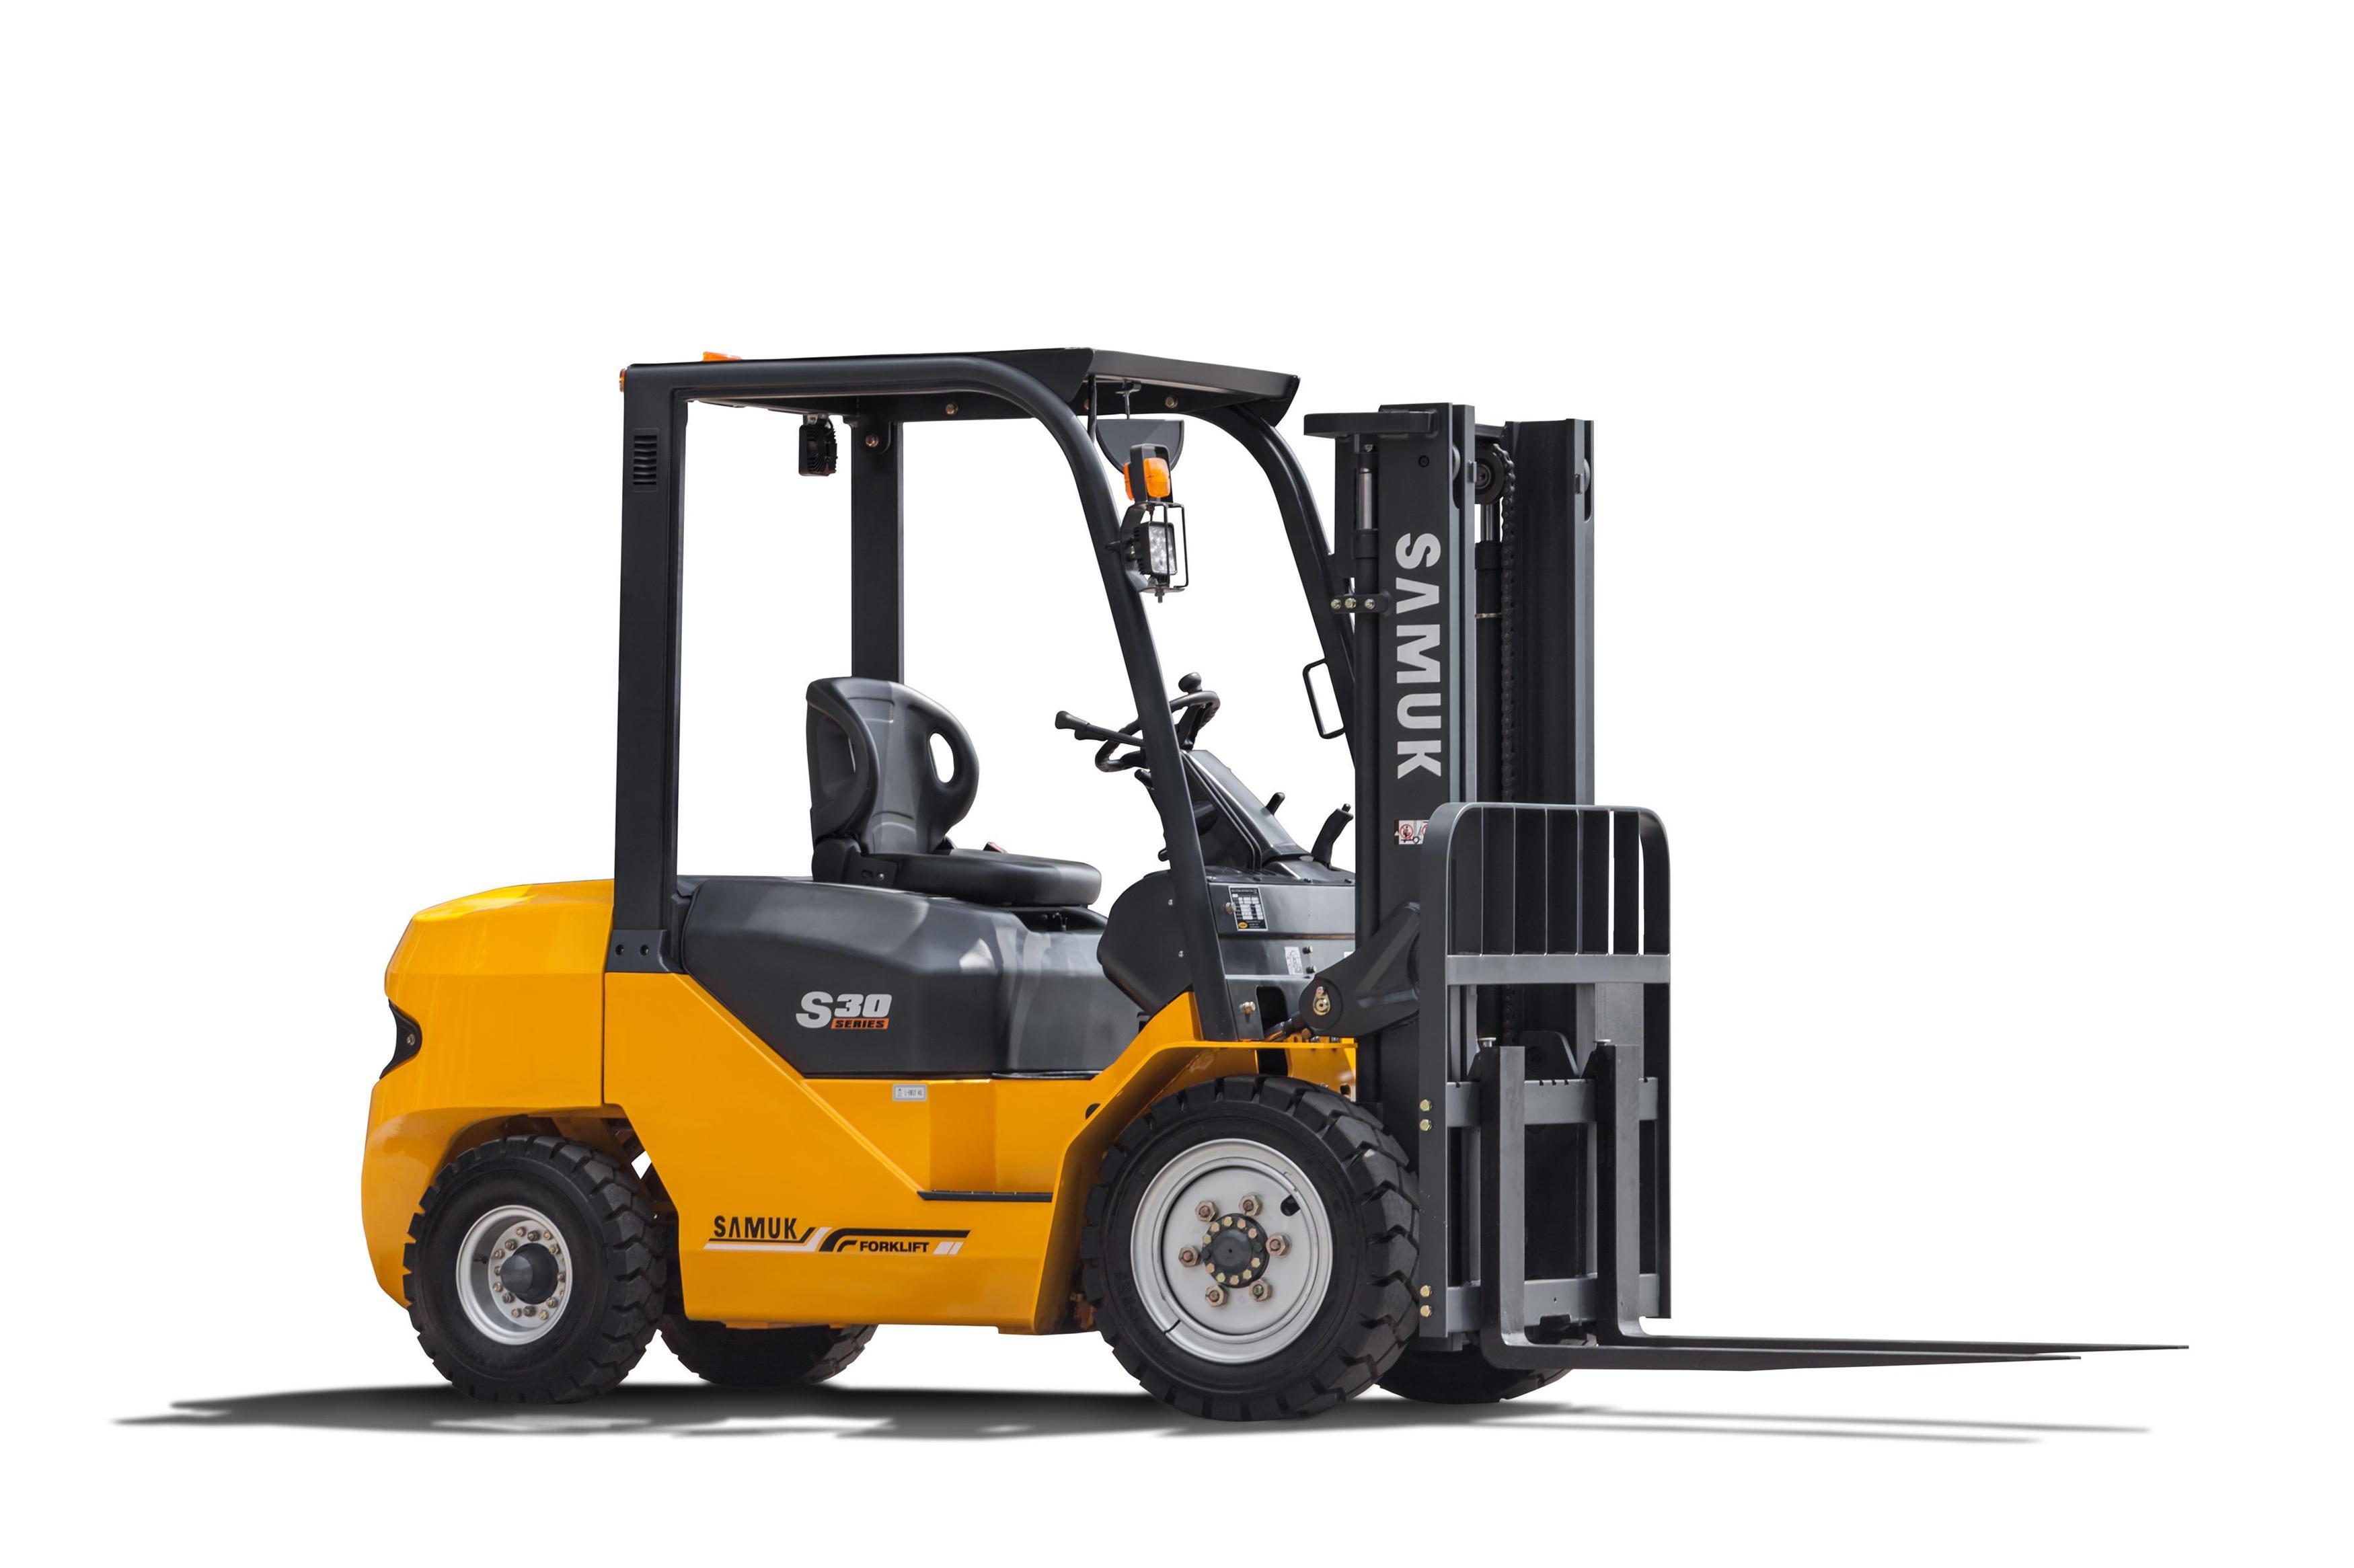 Diesel Forklift 1.5-3.5ton